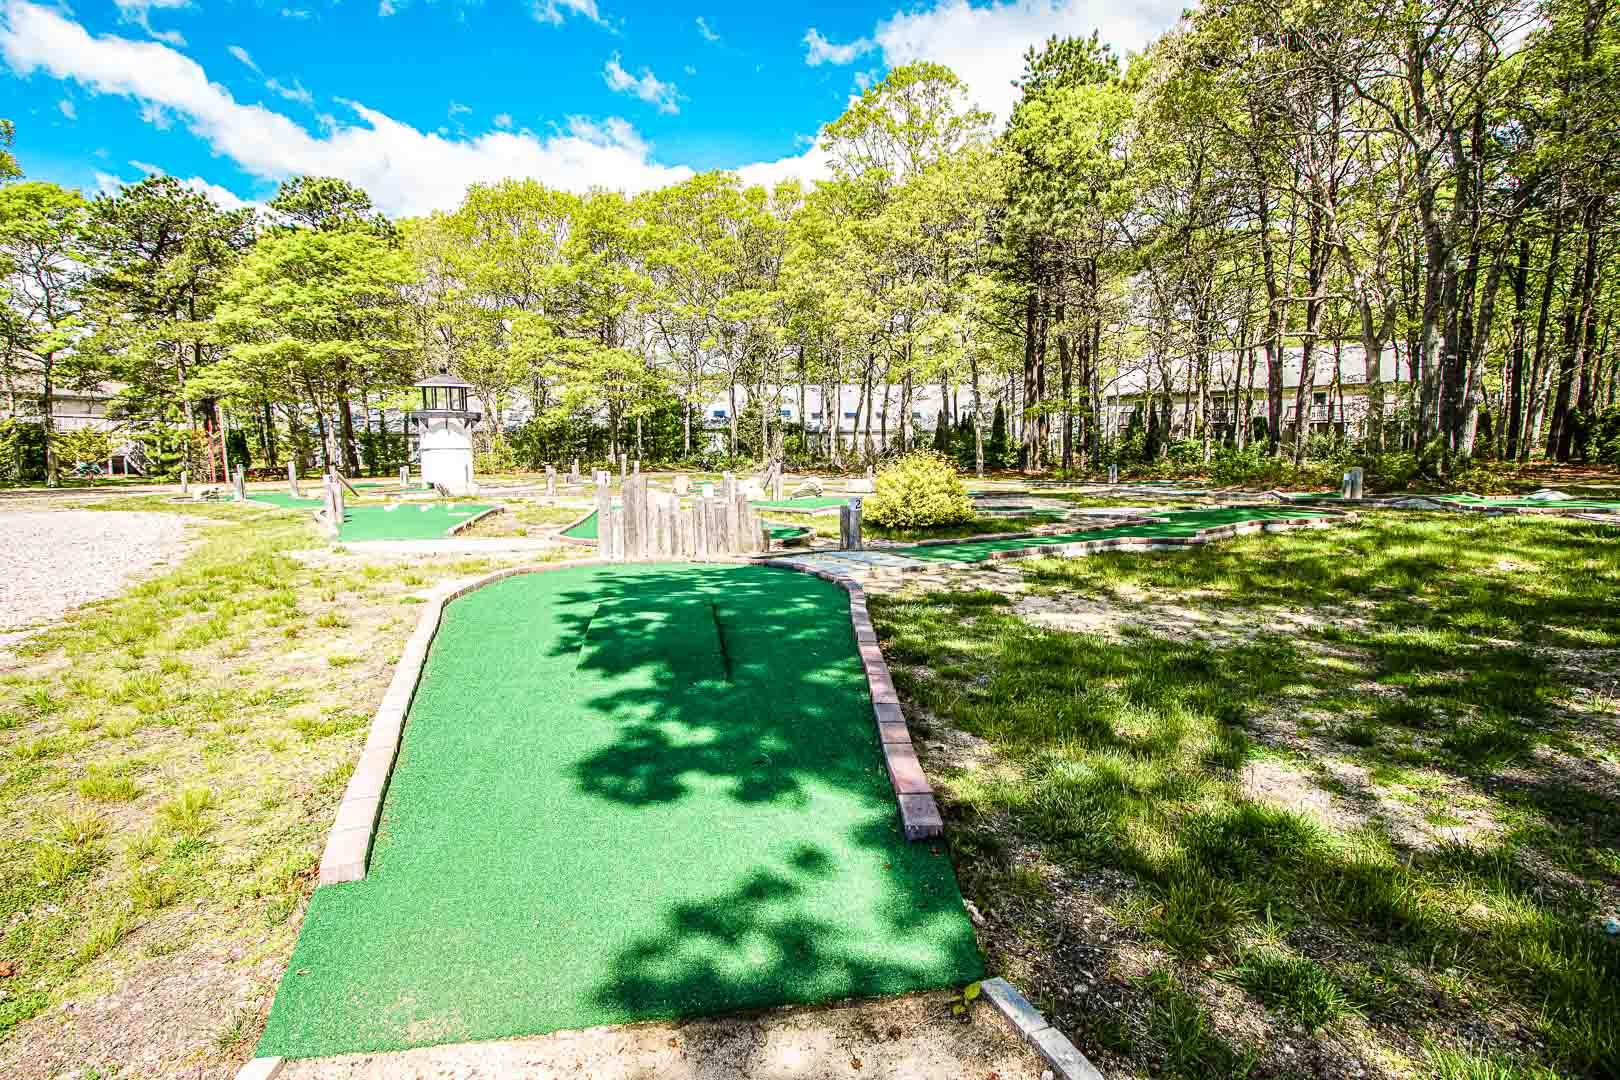 A beautiful outside miniture golf area at VRI's Sea Mist Resort in Massachusetts.